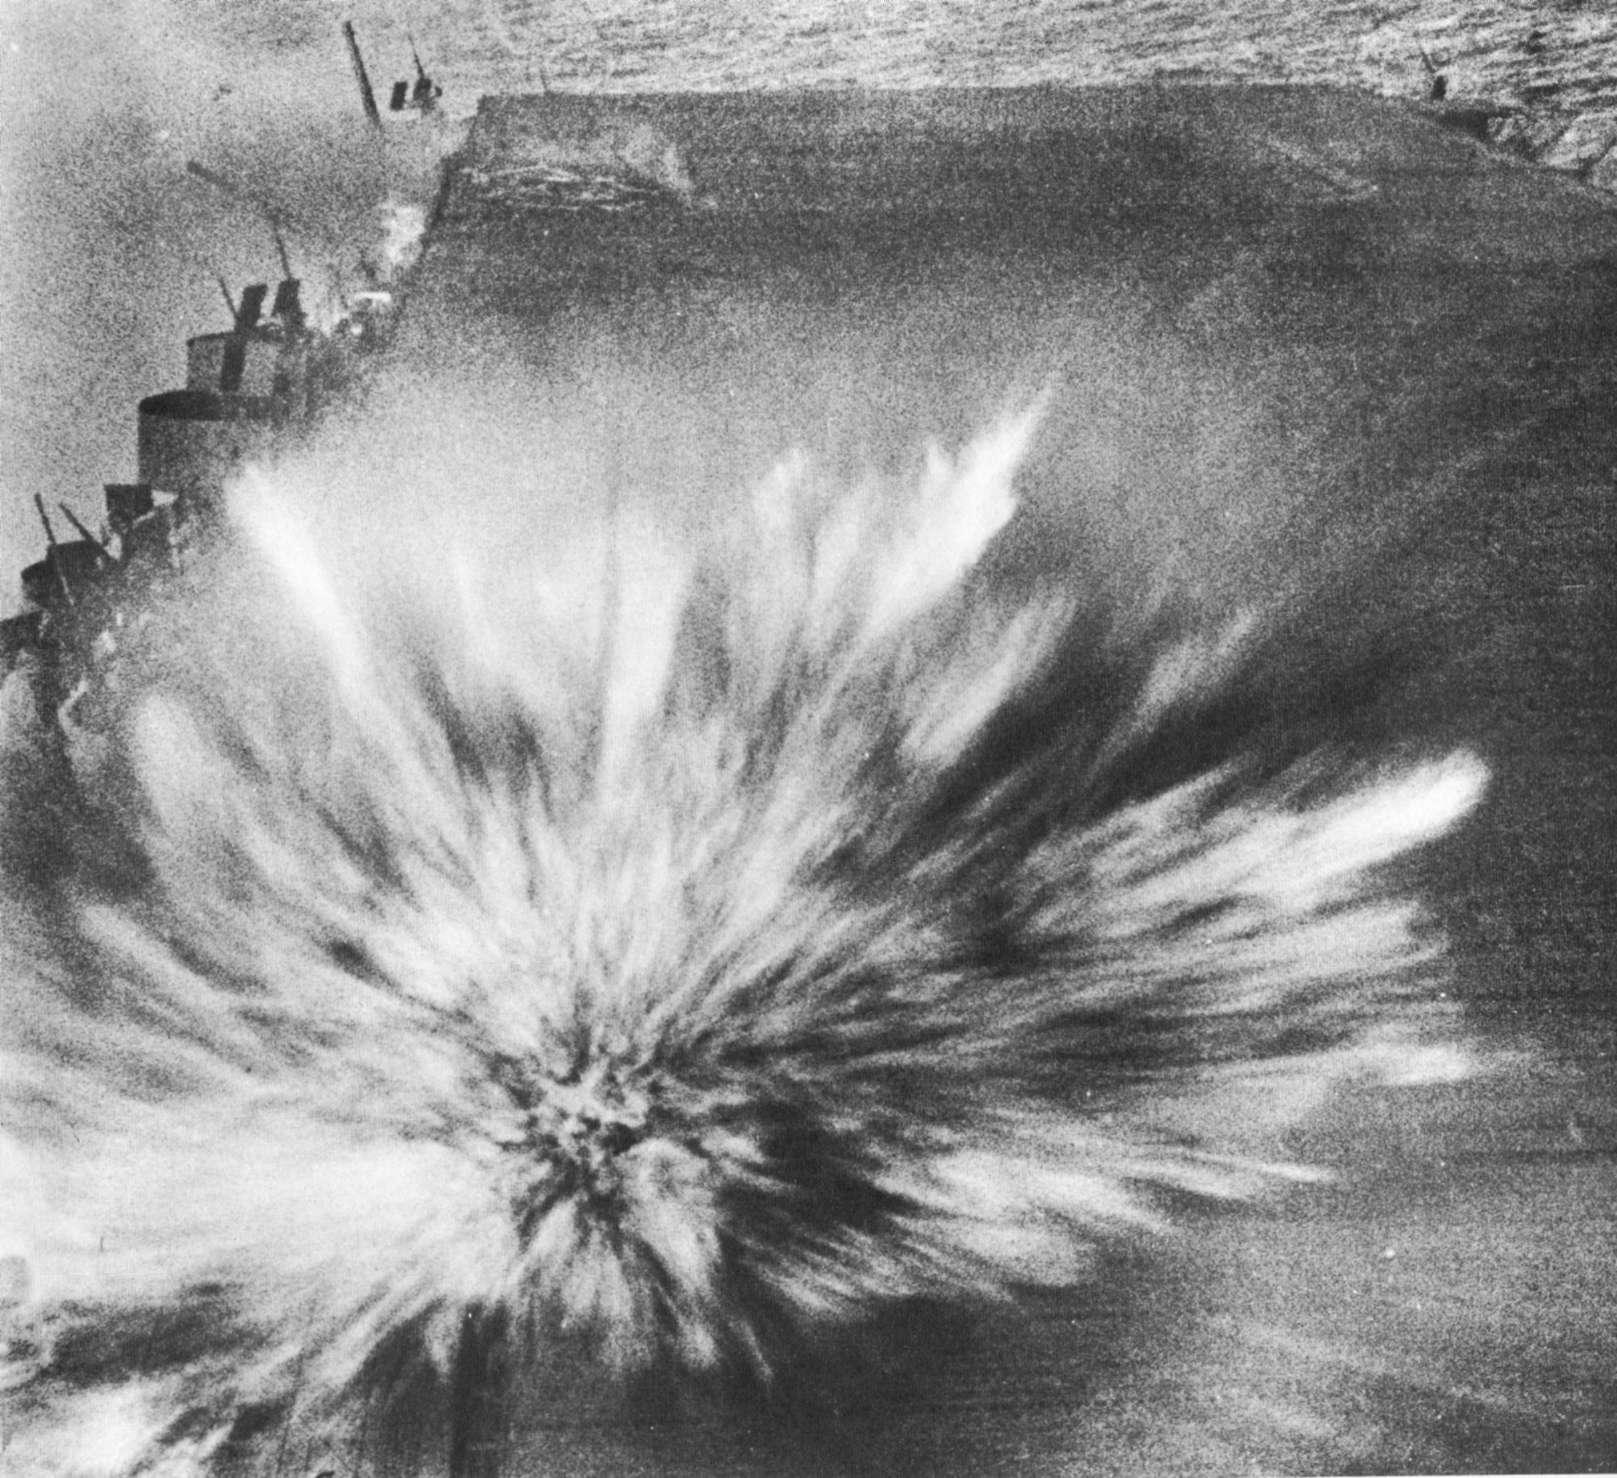 japanese bomb hits deck of uss enterprise, 1942